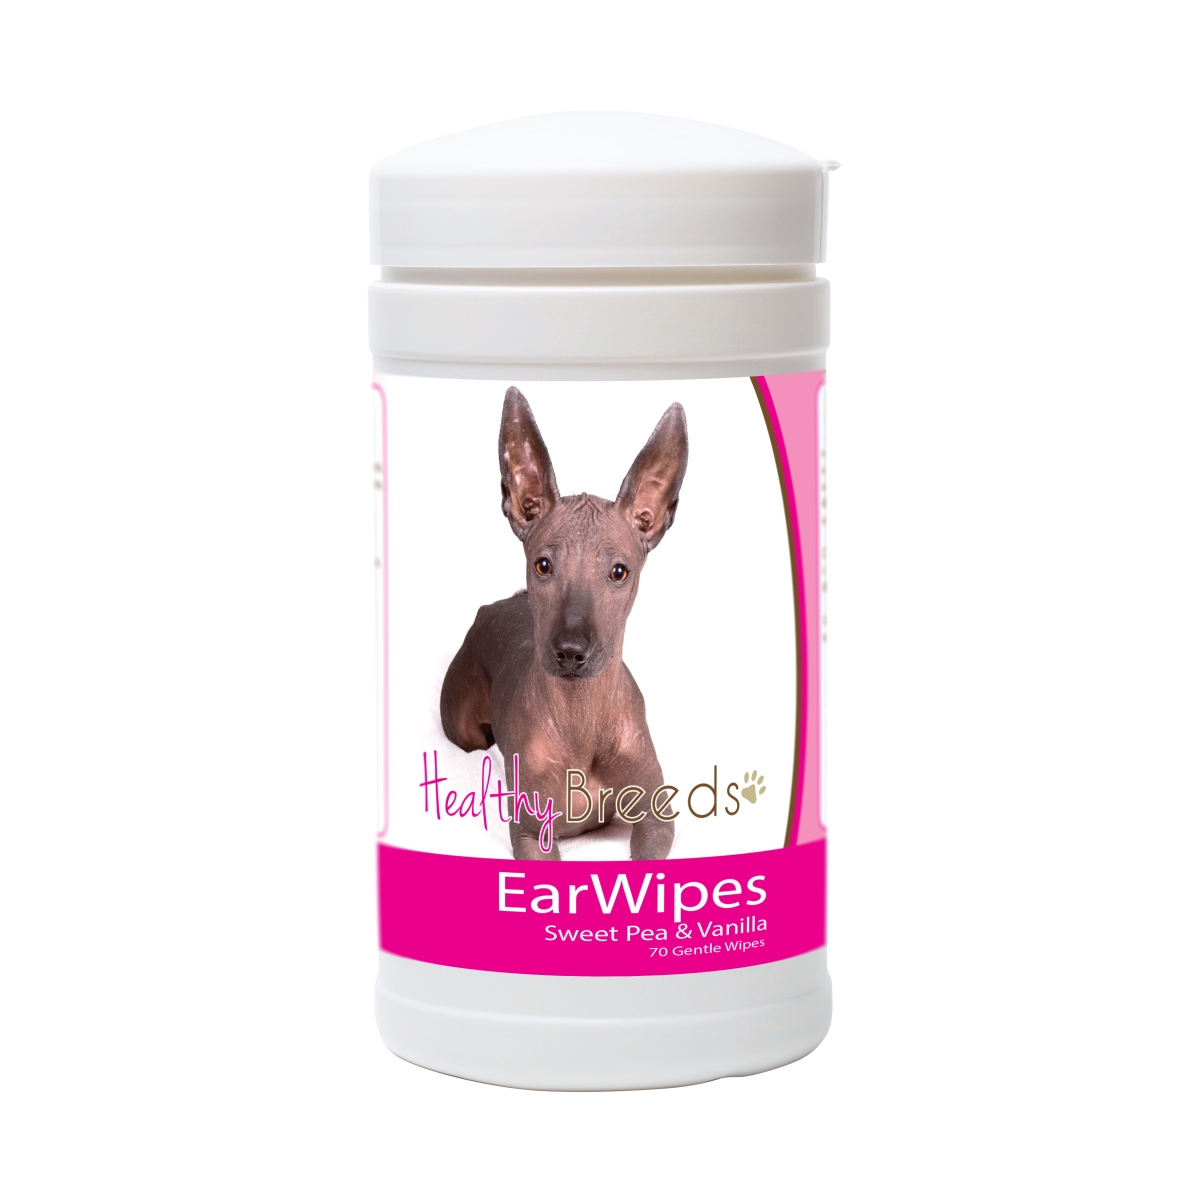 Healthy Breeds 840235178729 Xoloitzcuintli Ear Wipes - 70 Count